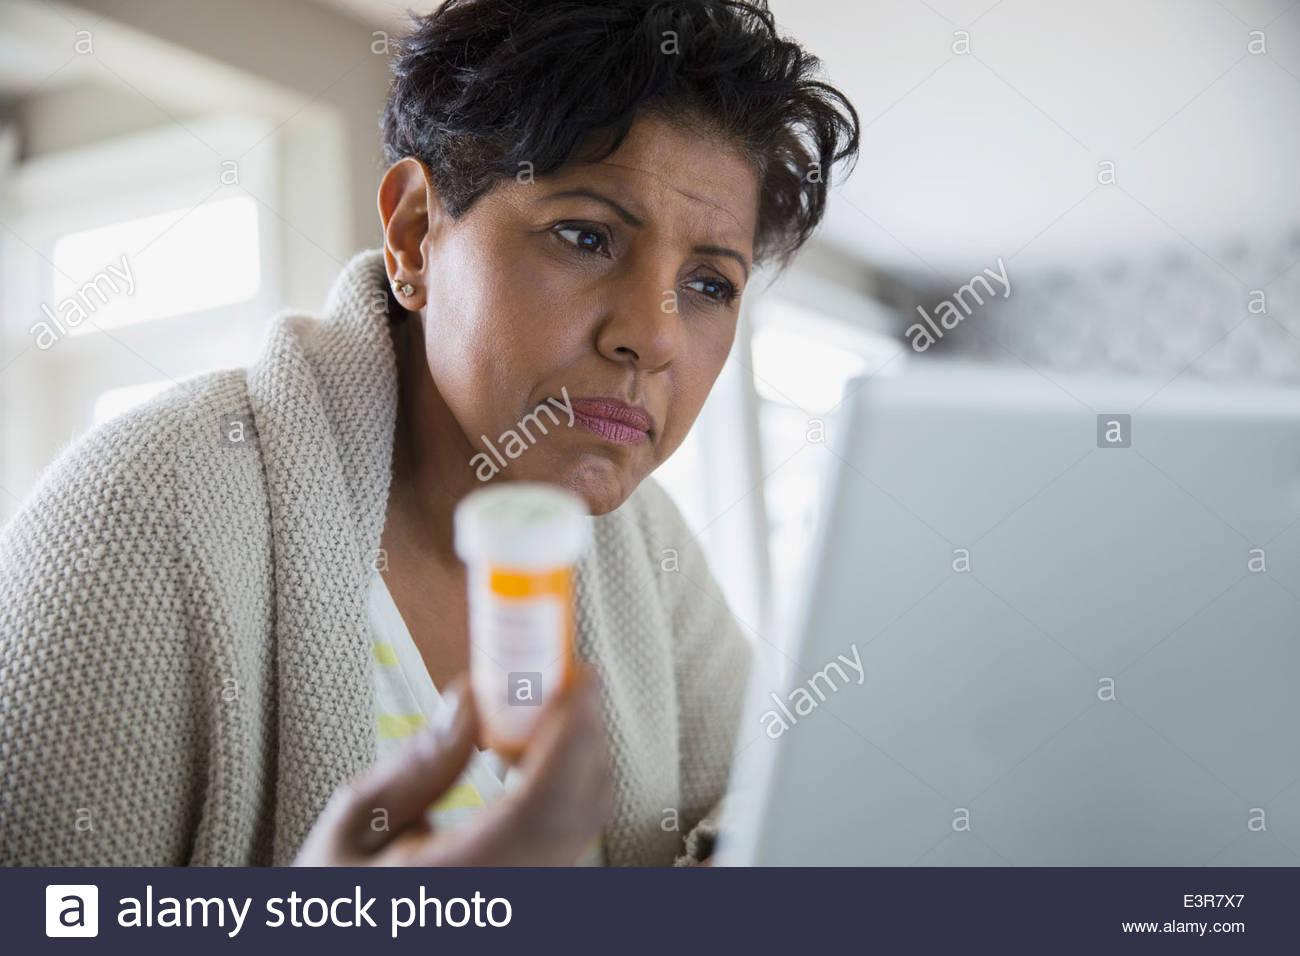 Concerned woman holding prescription bottle at laptop - Stock Image